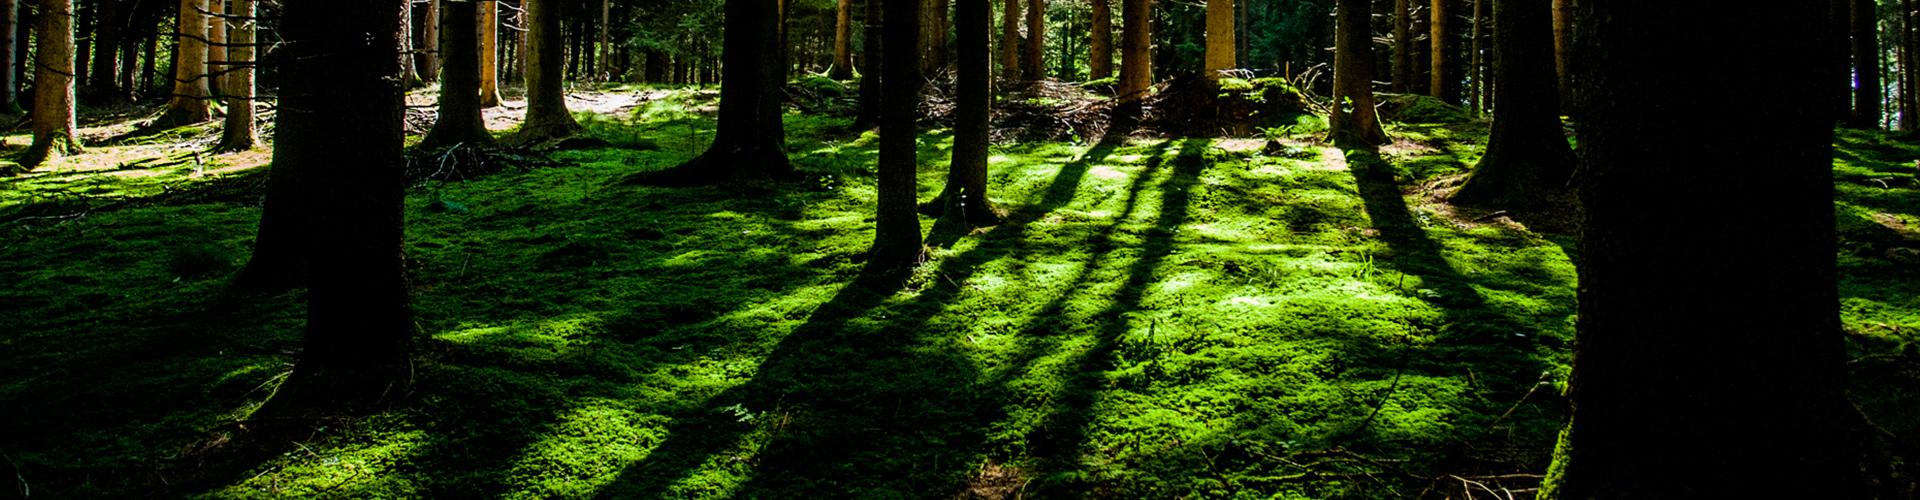 trees-long